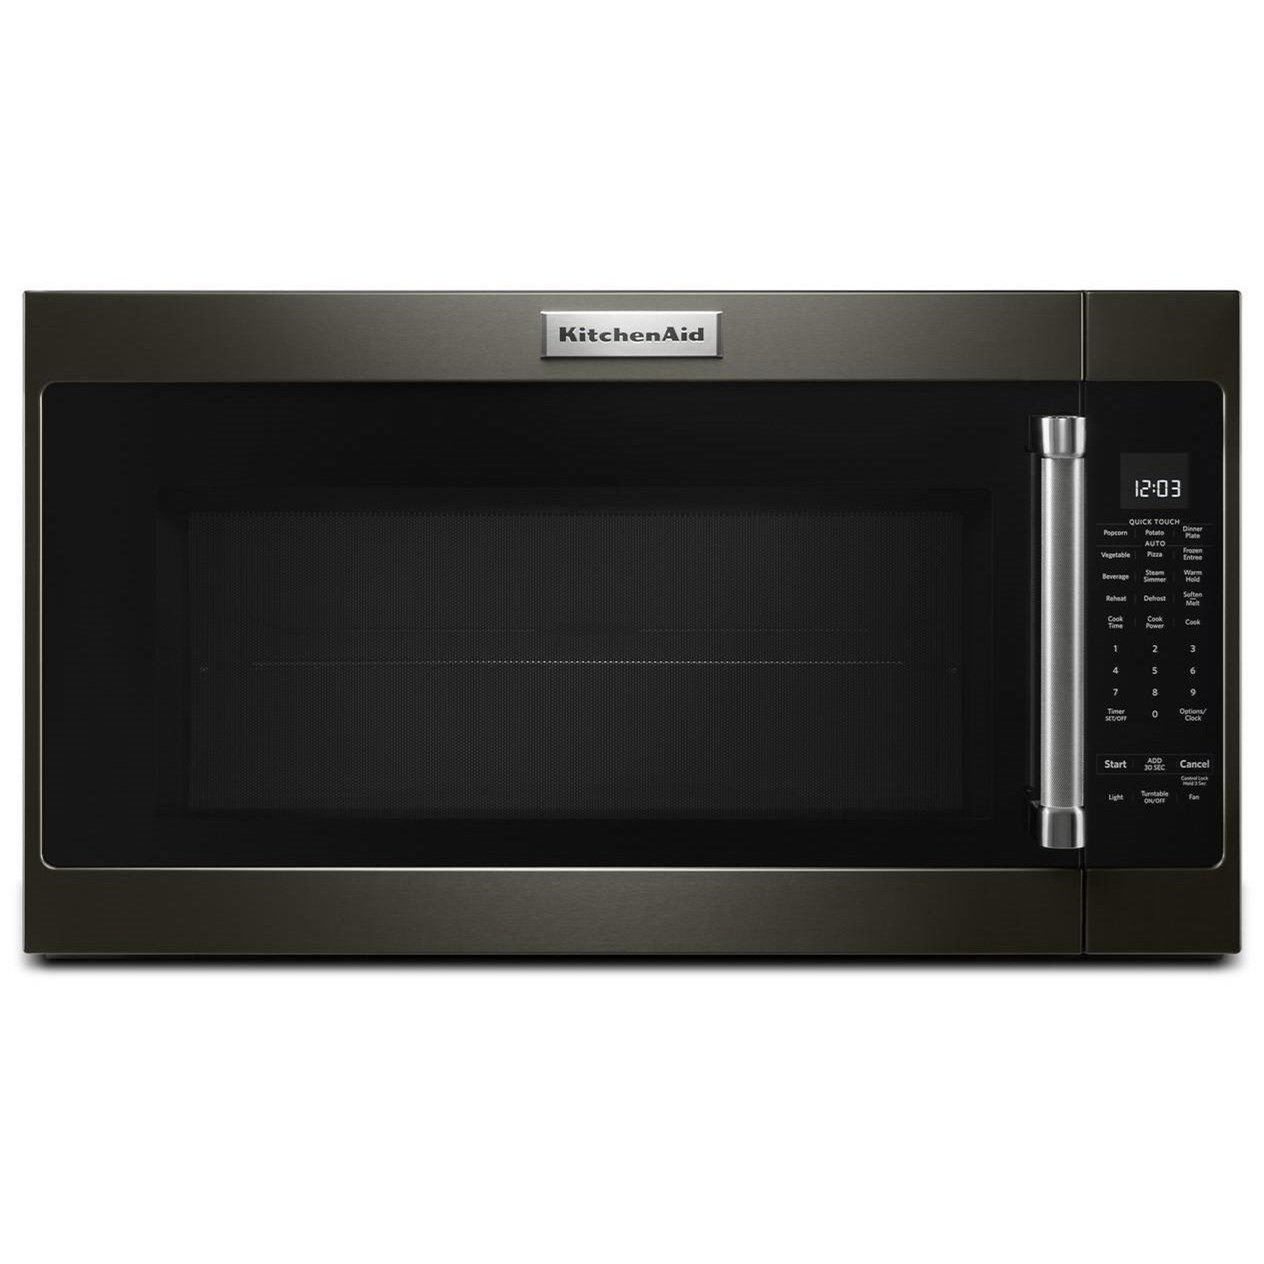 kitchenaid kmhs120ebs 2.0 cu. ft. 1000-watt microwave with